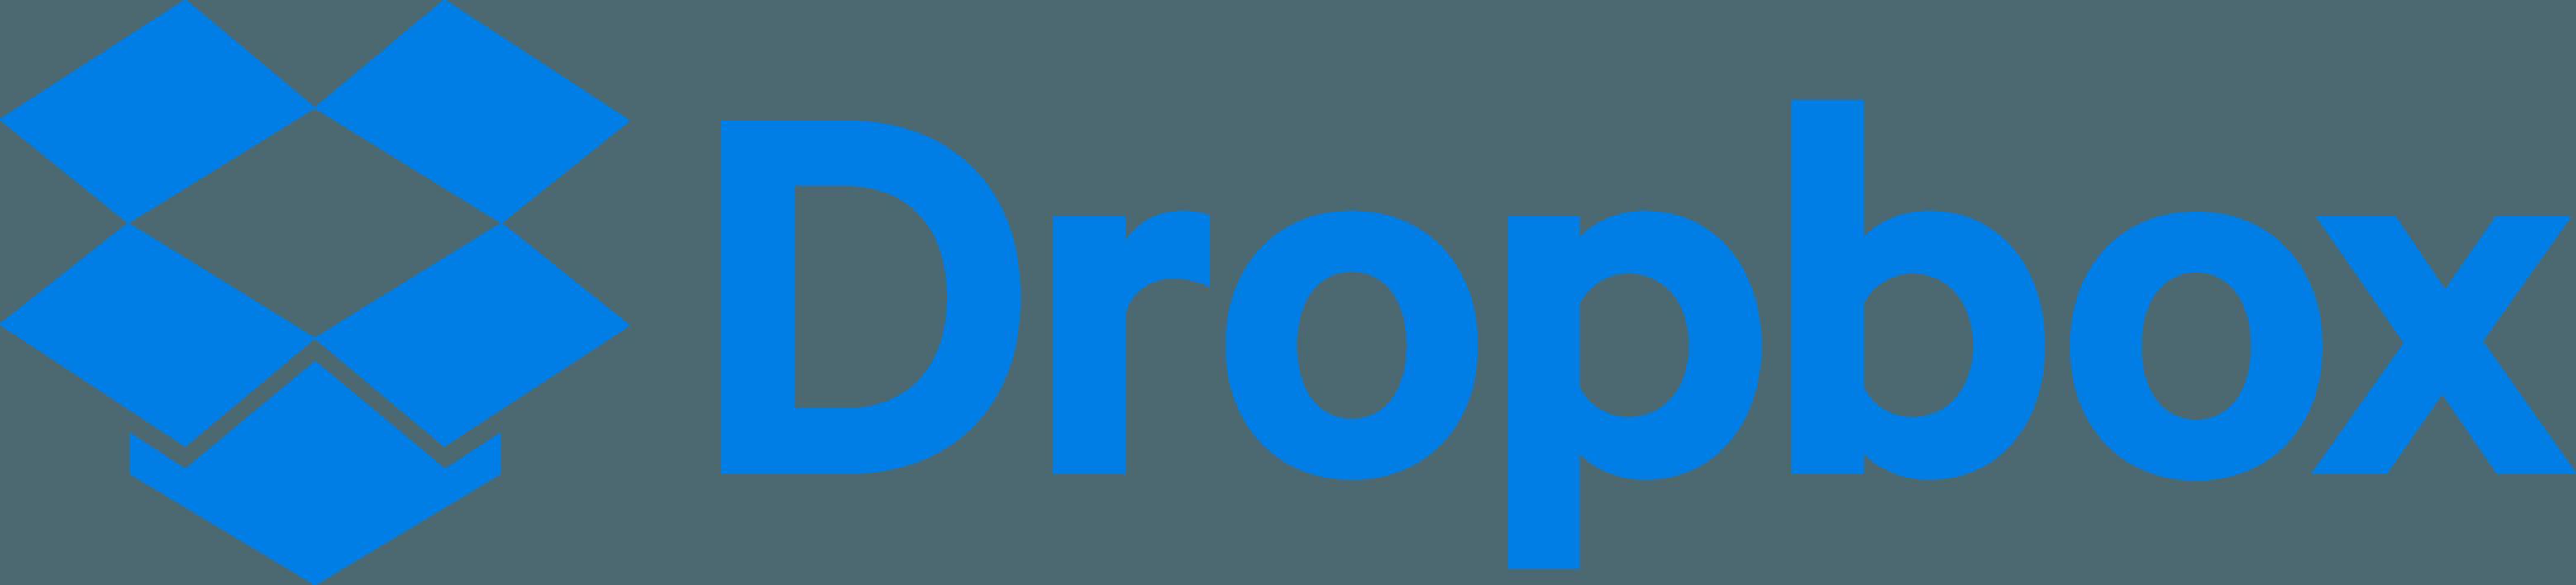 Dropbox Logo [EPS File] Vector EPS Free Download, Logo, Icons, Brand Emblems